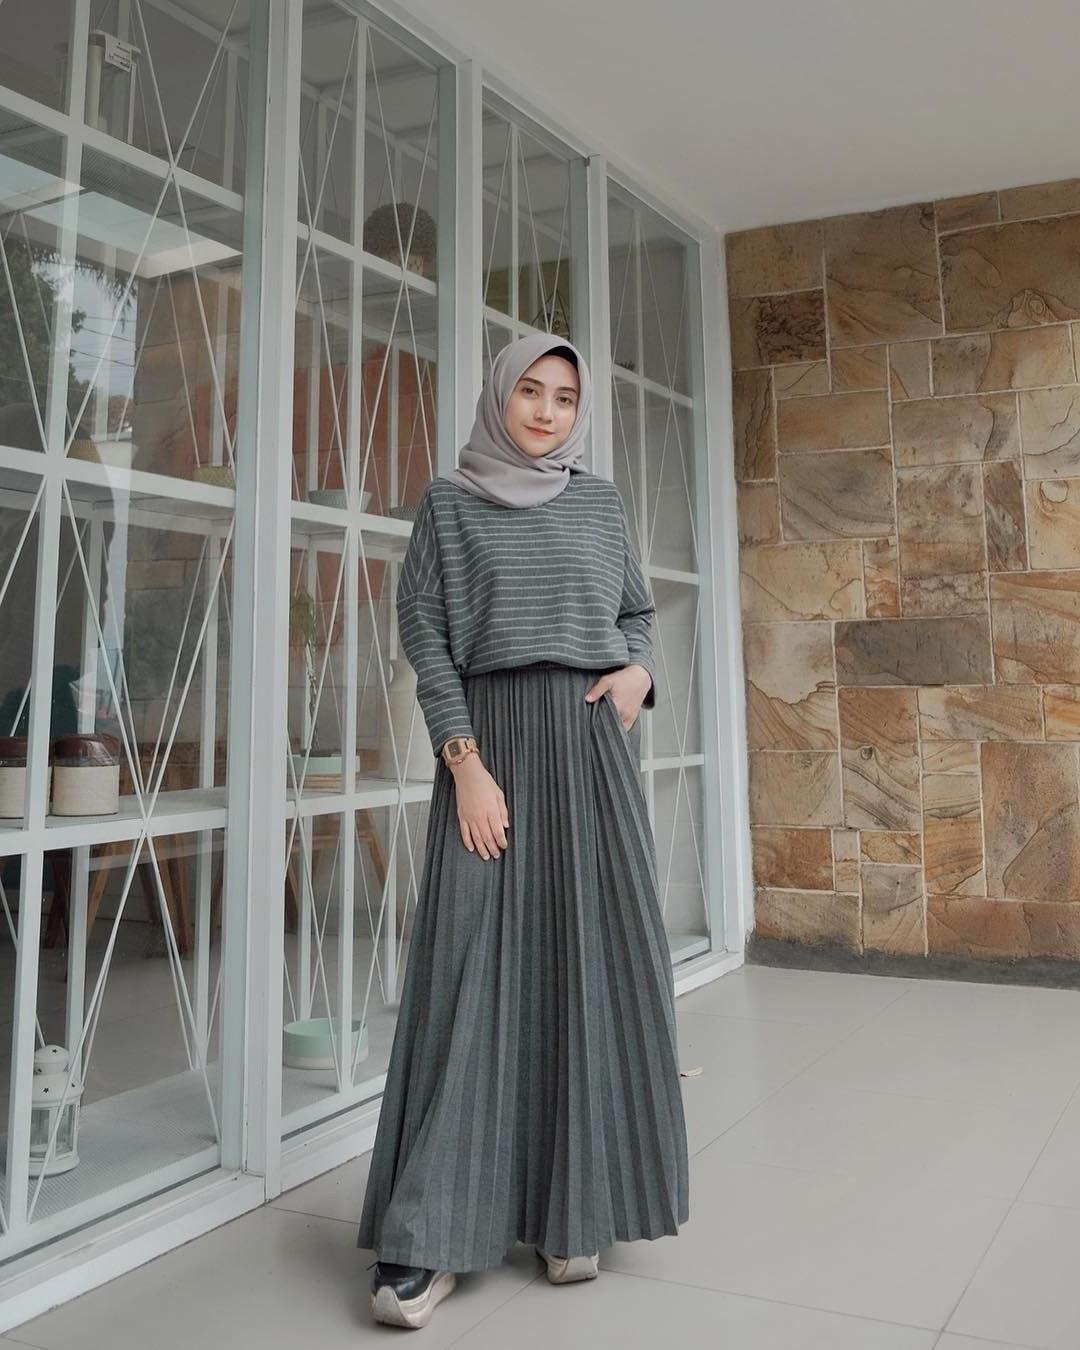 Inspirasi Inspirasi Baju Lebaran 2019 U3dh Baju Muslim Lebaran Terbaru 2019 Dengan Gambar